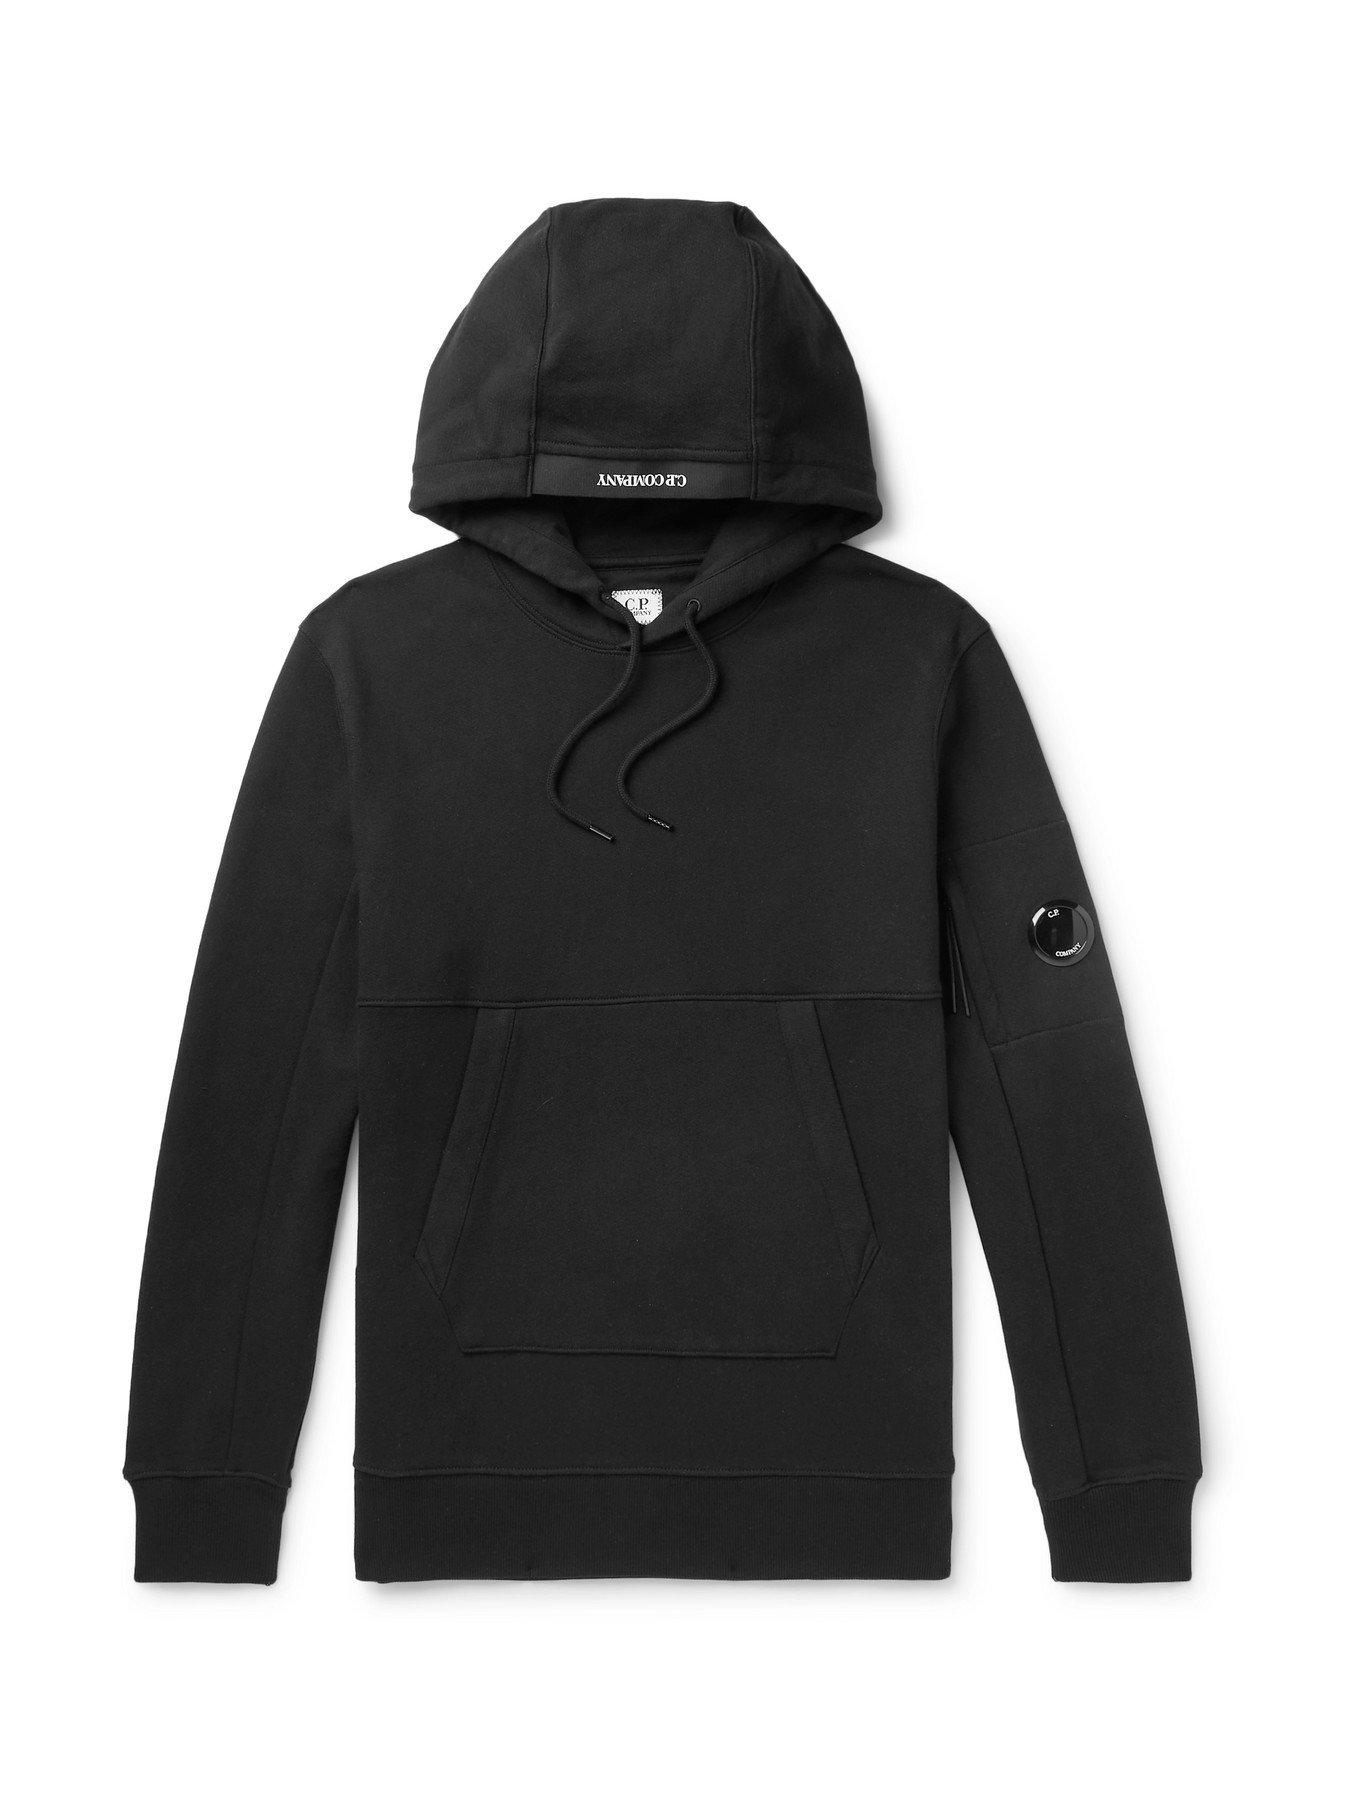 C.P. COMPANY - Logo-Appliquéd Garment-Dyed Cotton-Jersey Hoodie - Black - M